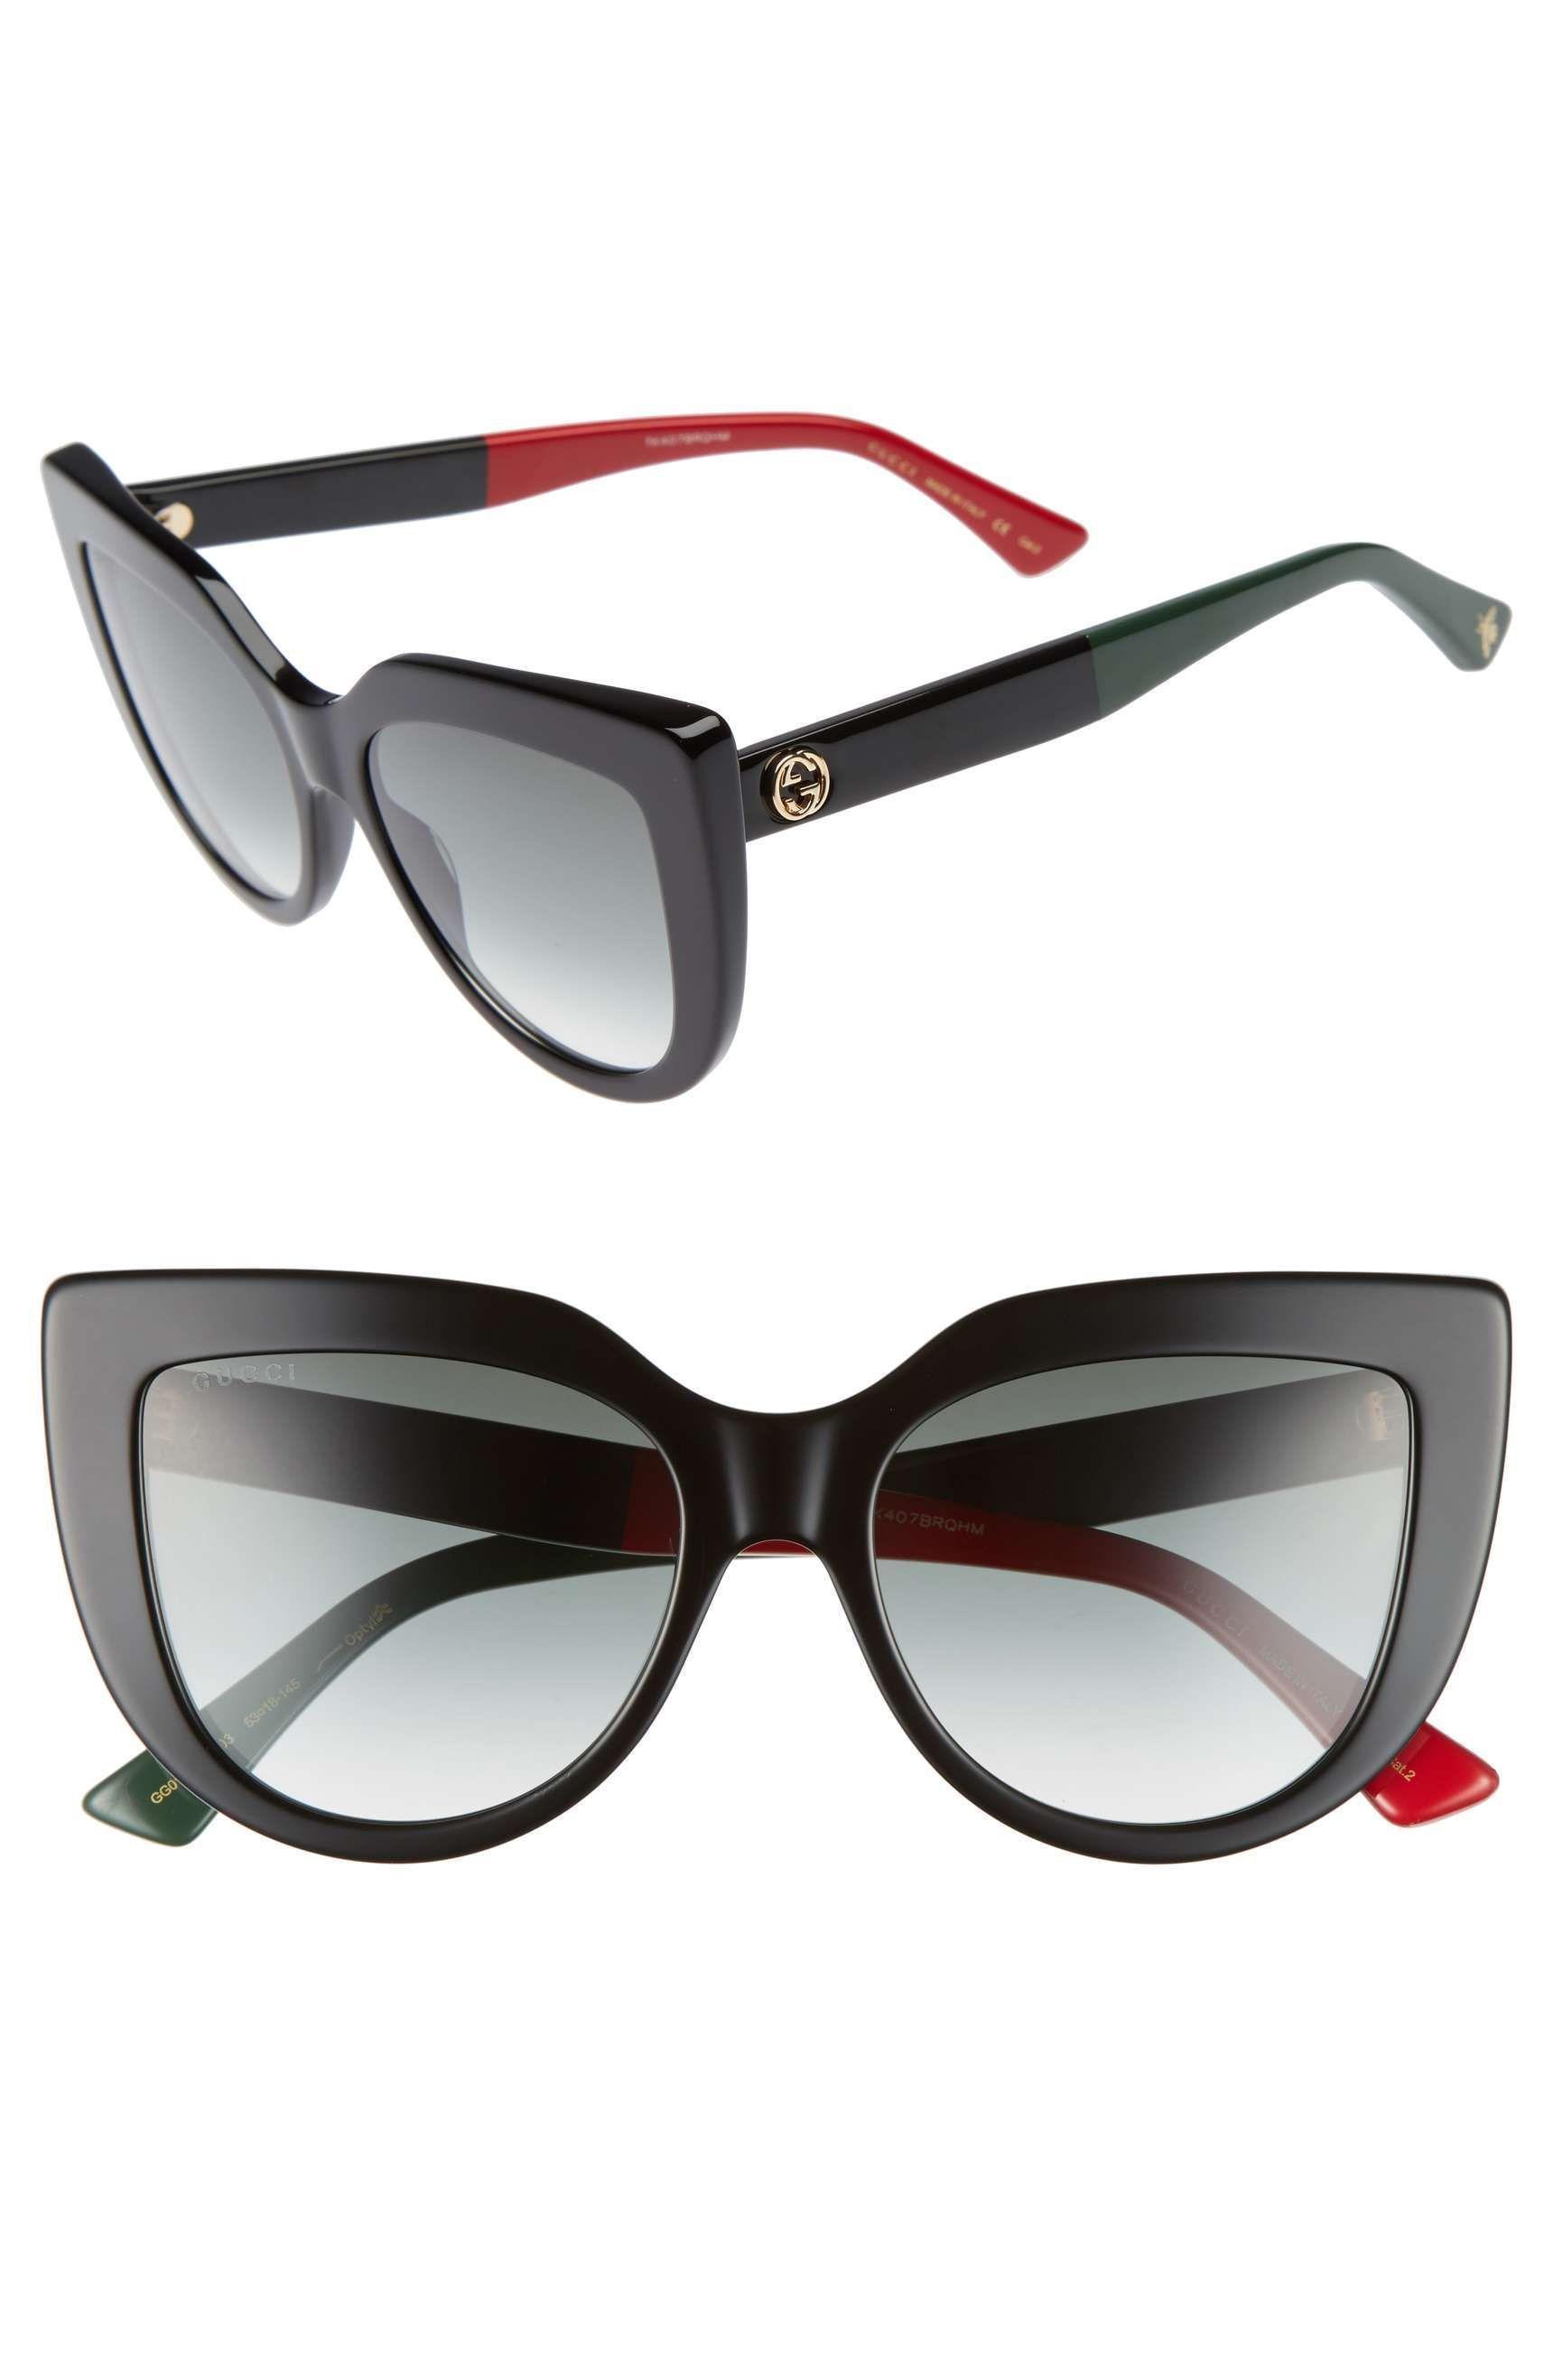 4e746c45e ... Hello Kitty Stretchable Bracelet Band Analog Watch for Girls, Women.  Main Image - Gucci 53mm Cat Eye Sunglasses